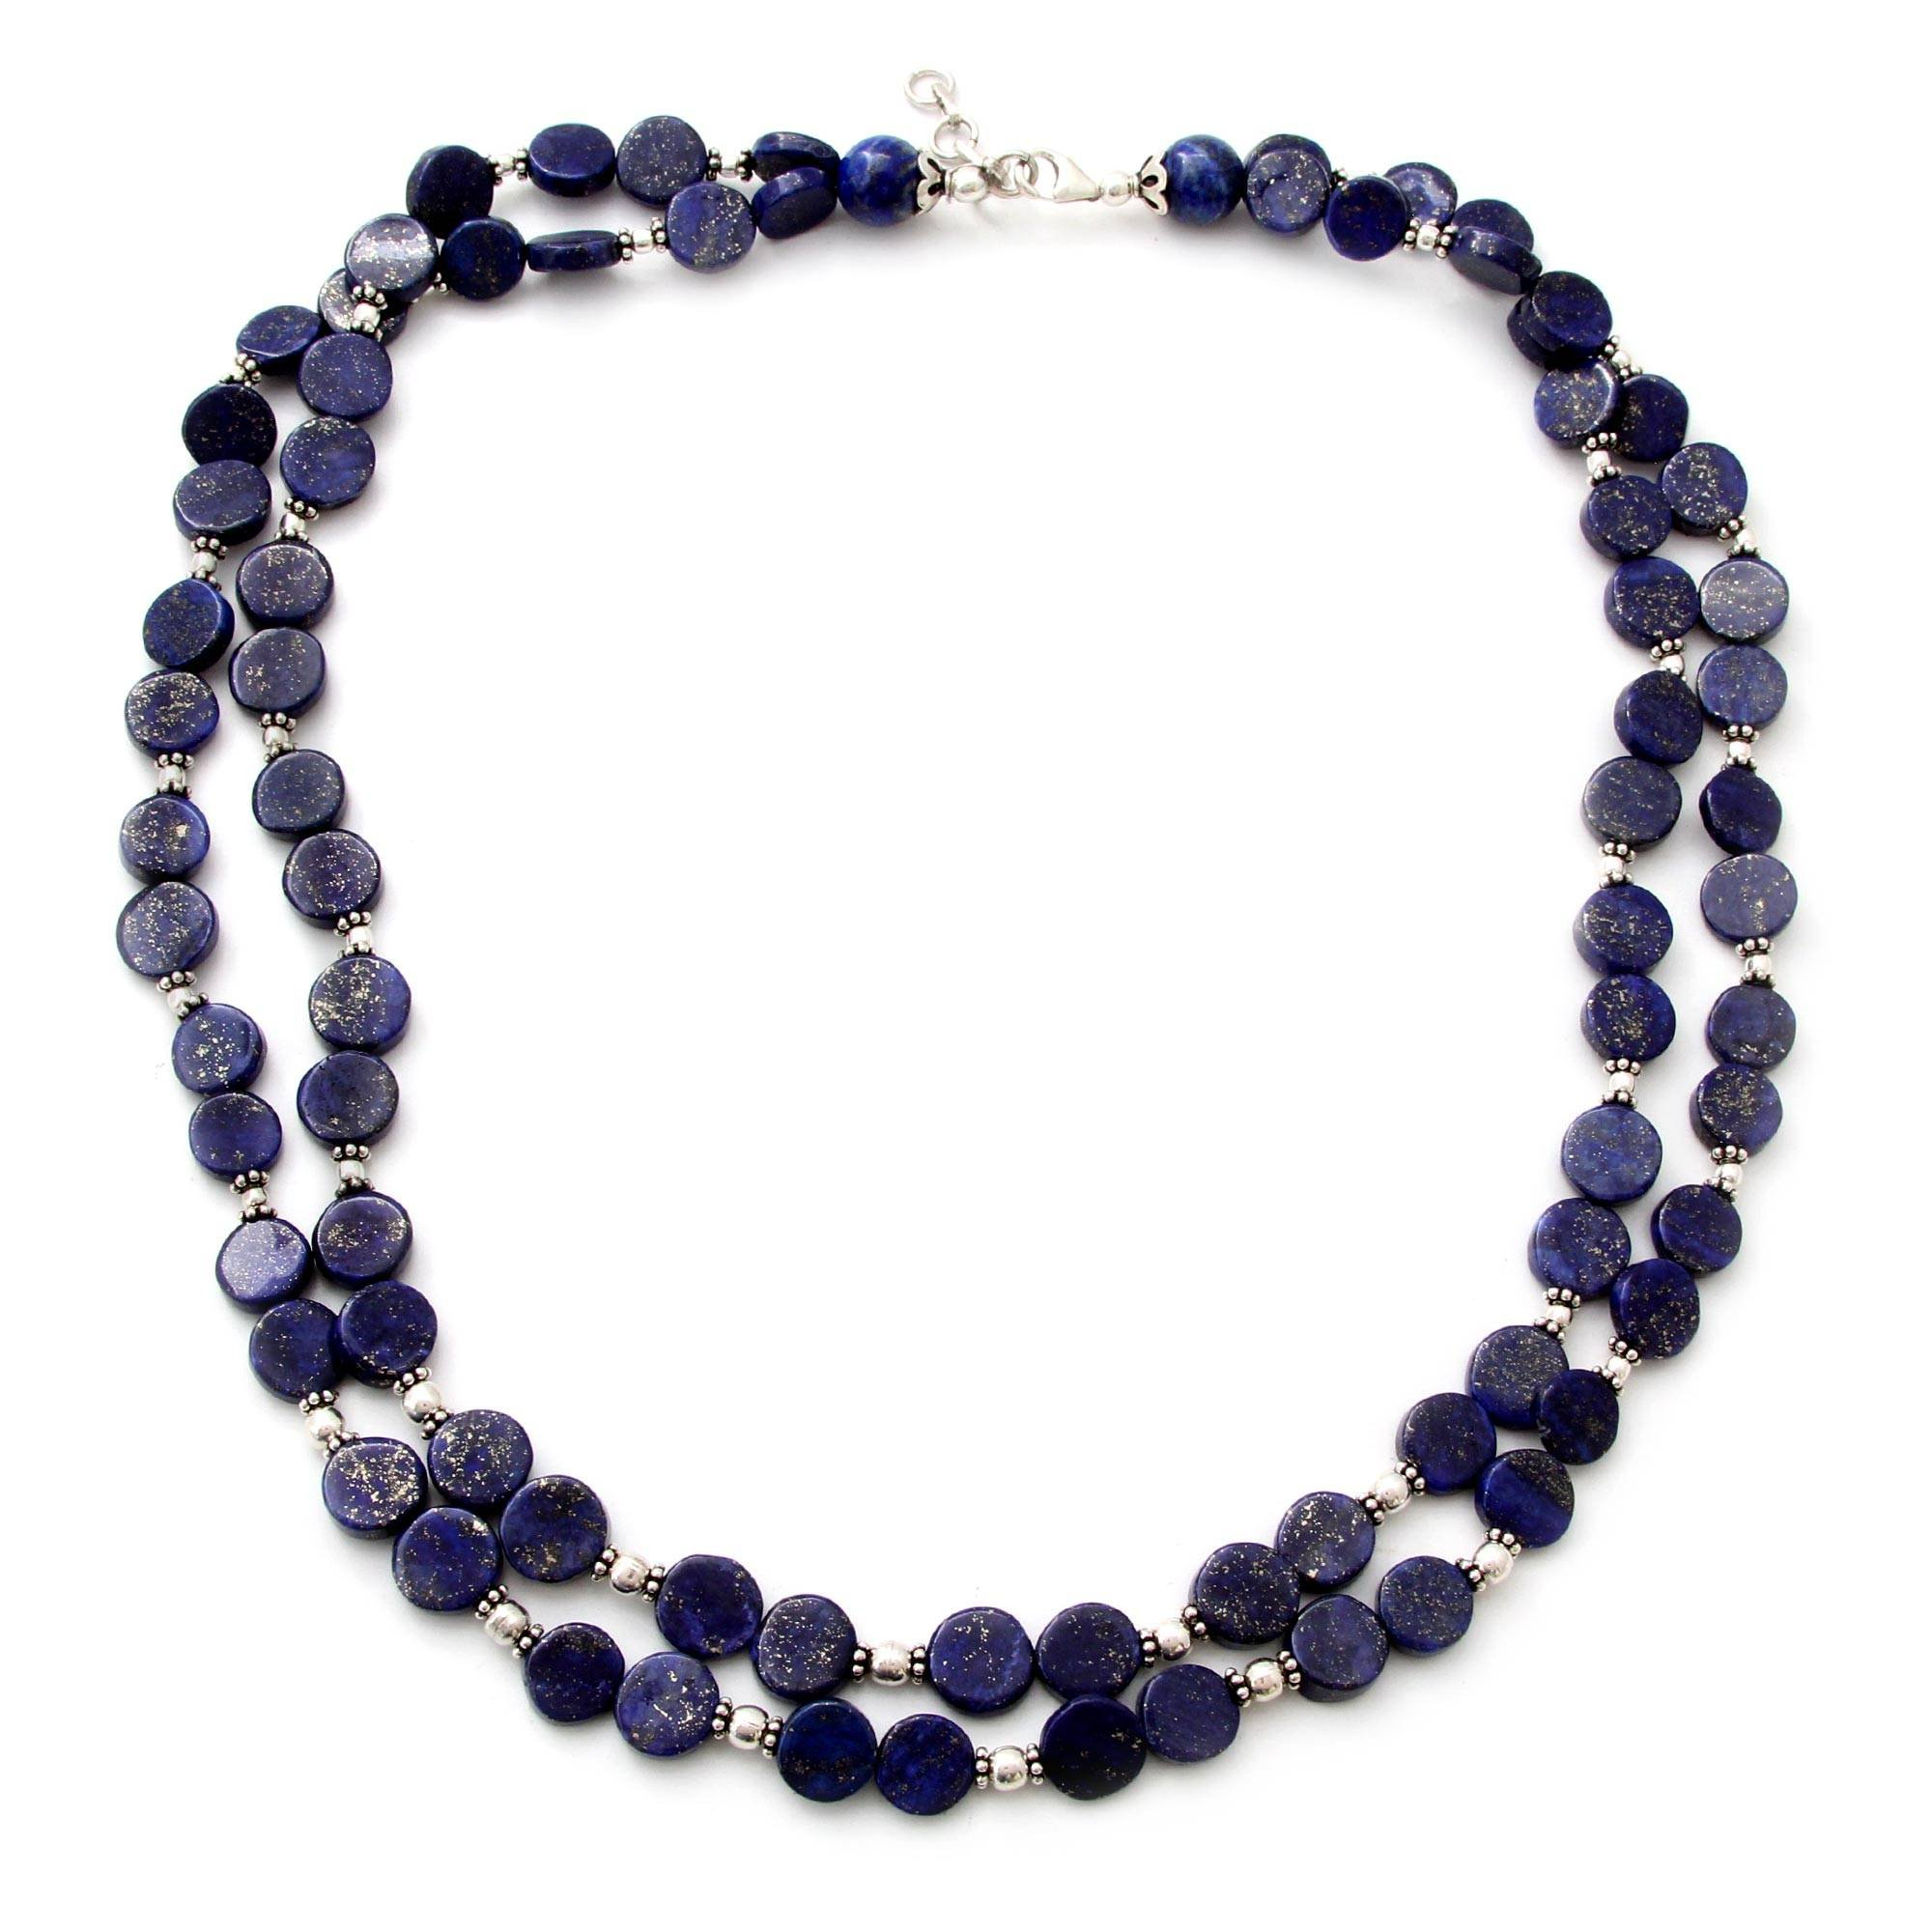 NOVICA Lapis Lazuli .925 Sterling Silver Beaded Necklace, 20.5'' 'Blue Universe' by NOVICA